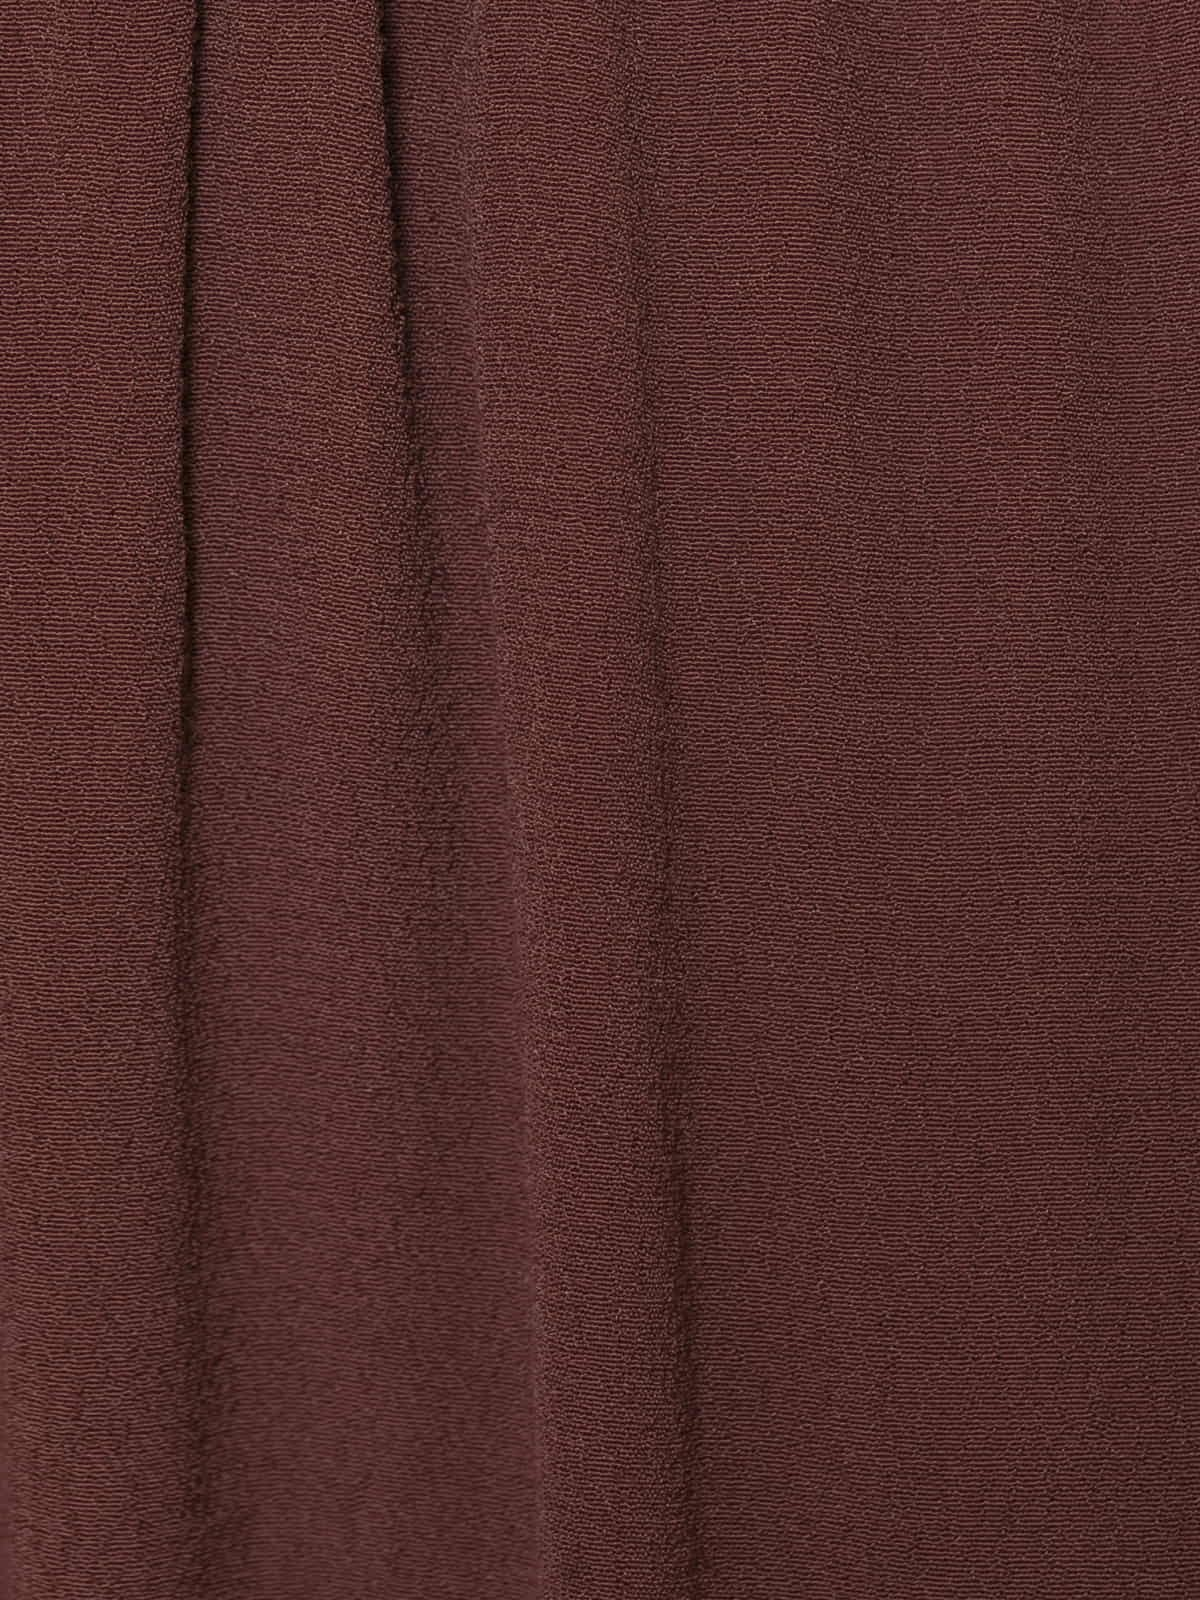 Falda crep Granate